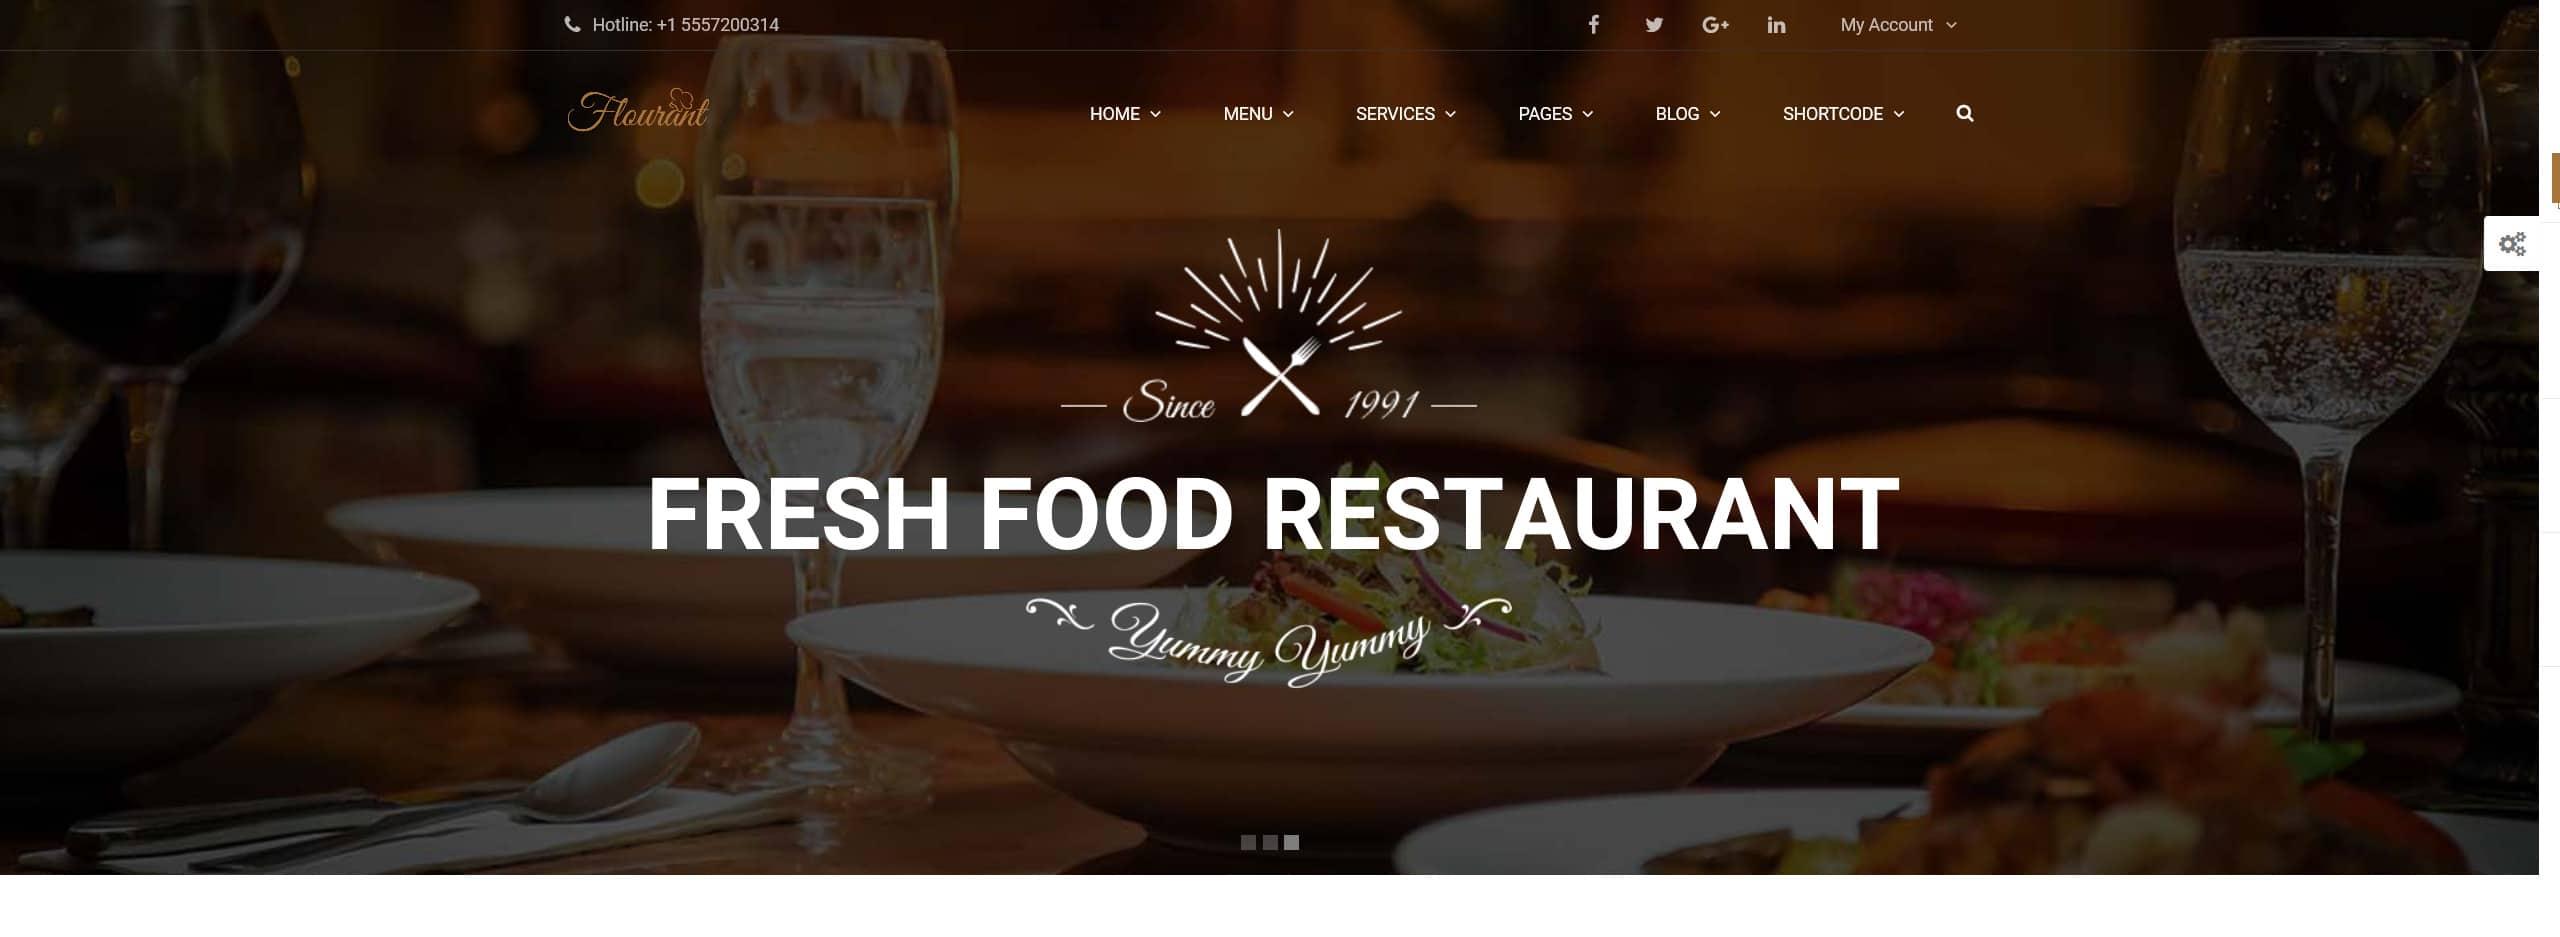 Restaurant Website Design, hilartech wordpress designs